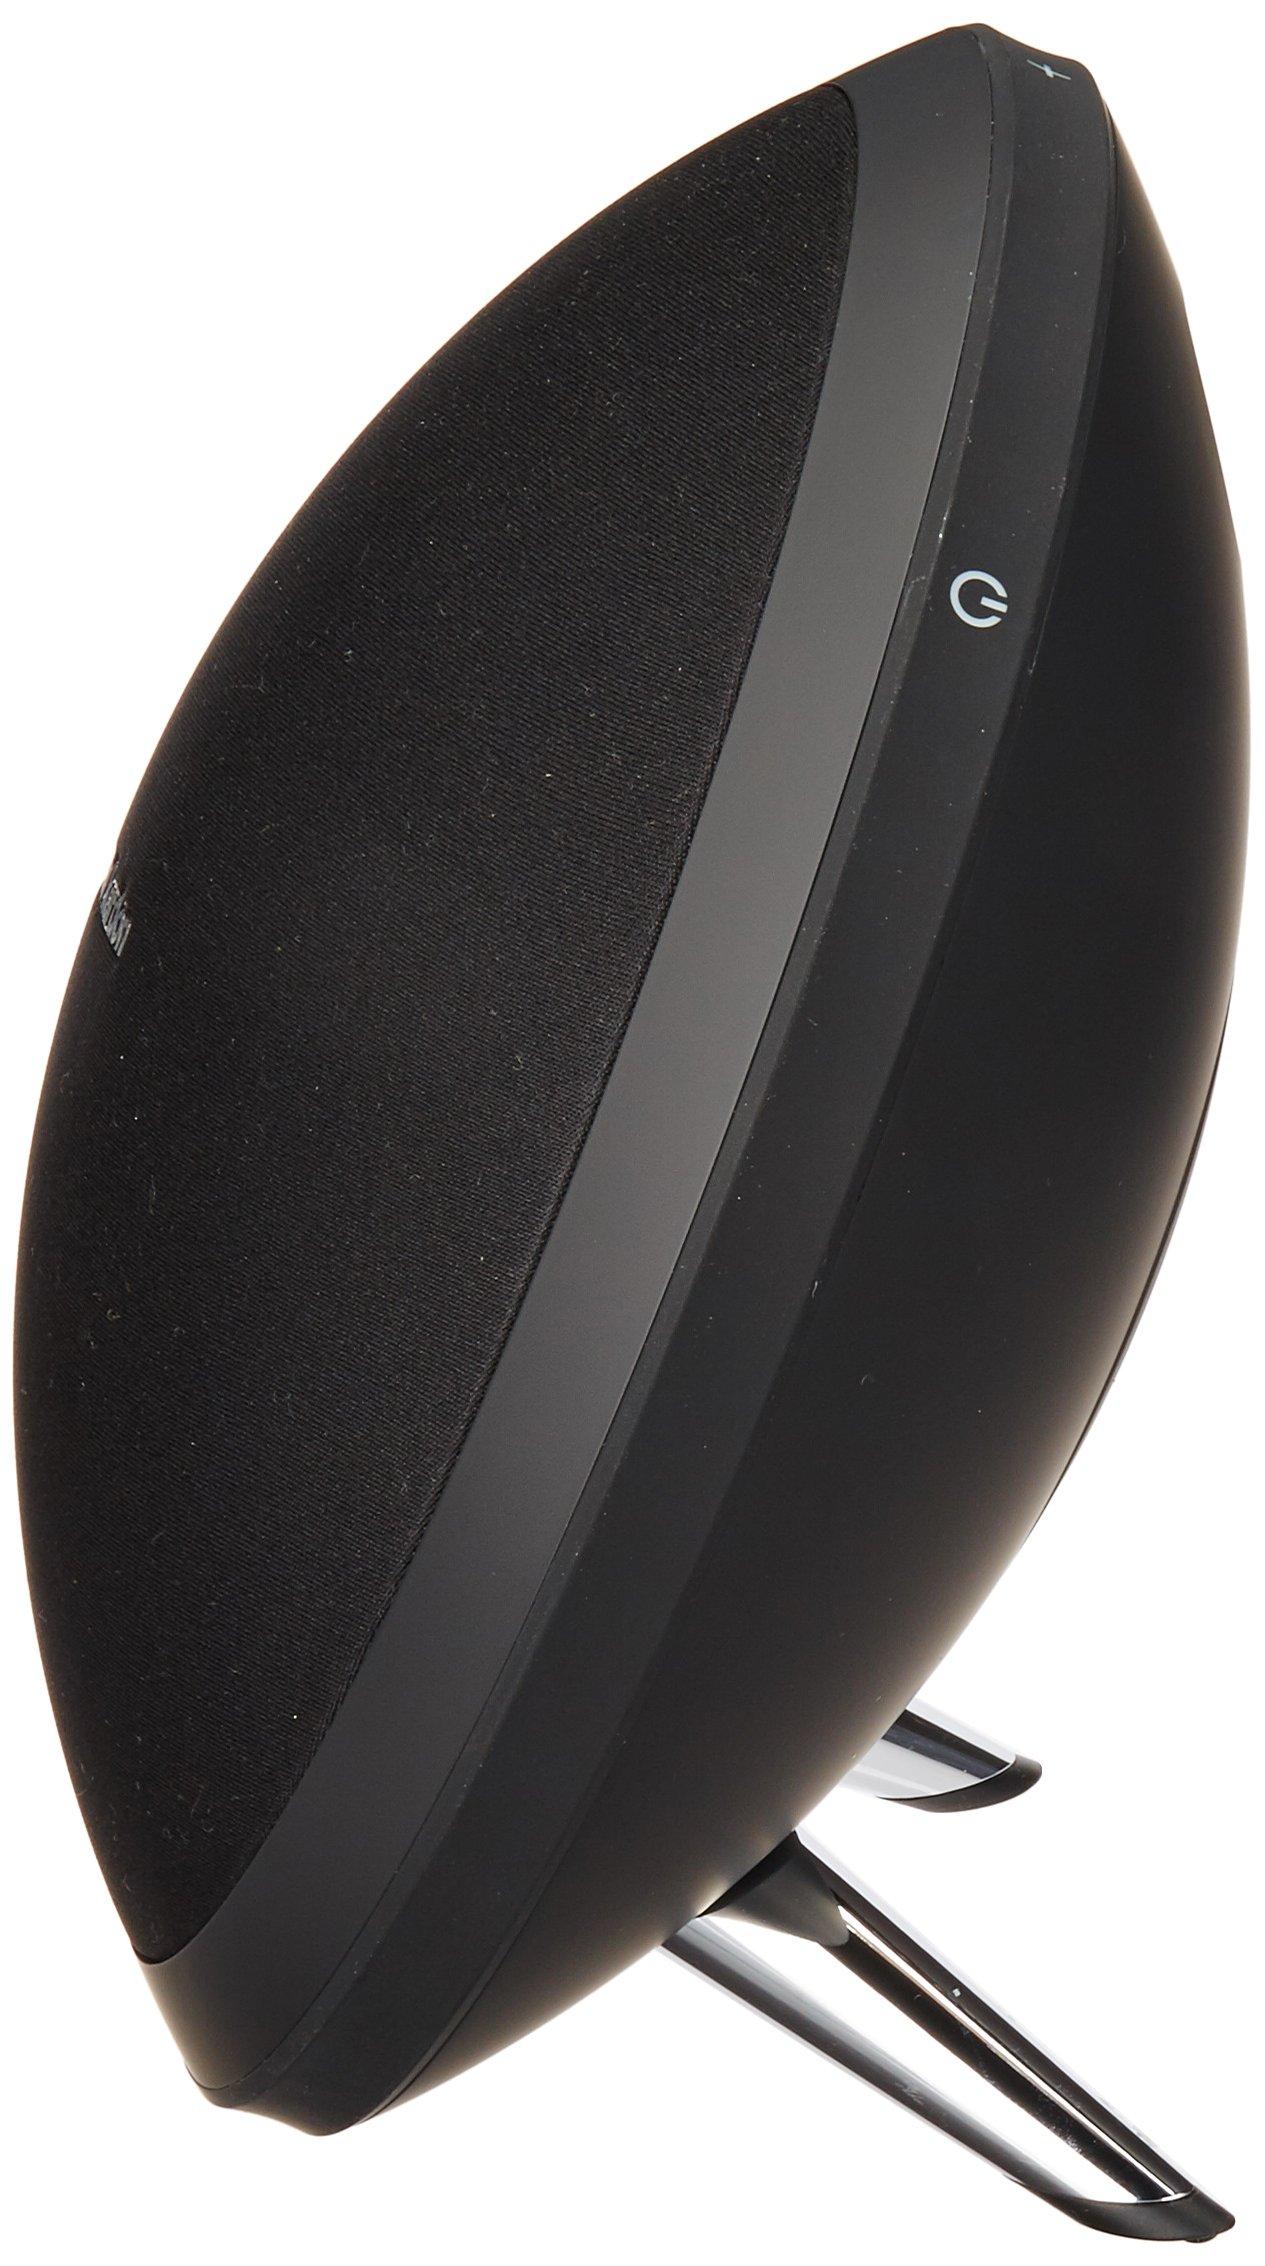 Harman Kardon Onyx Studio Wireless Bluetooth Speaker with rechargeable battery by Harman Kardon (Image #4)